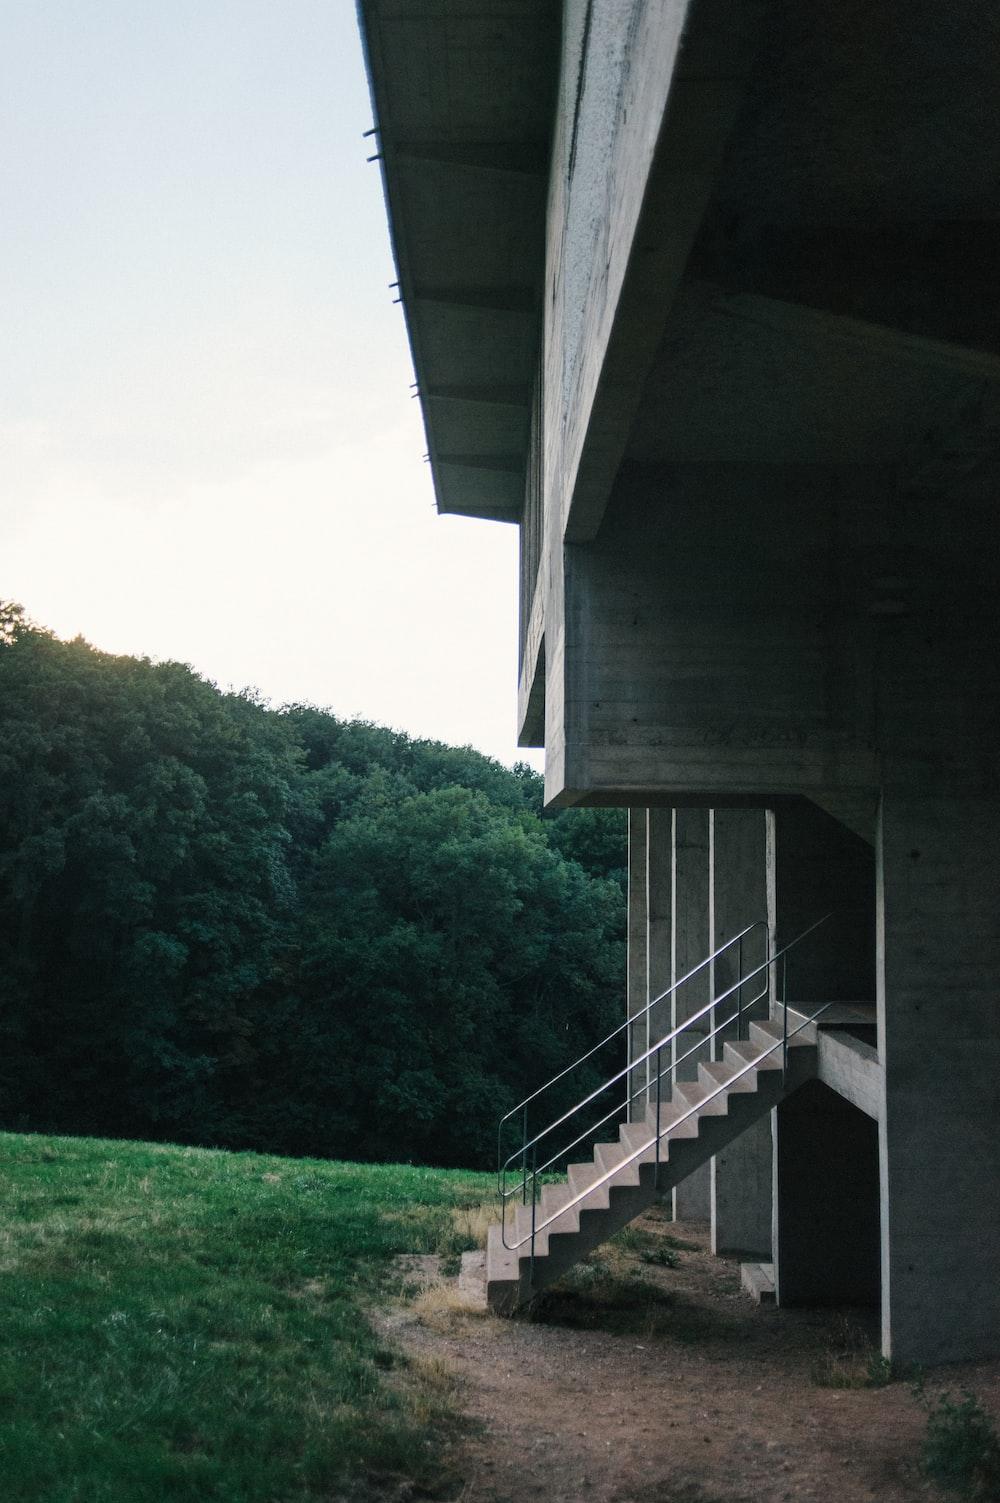 green grass field under gray concrete bridge